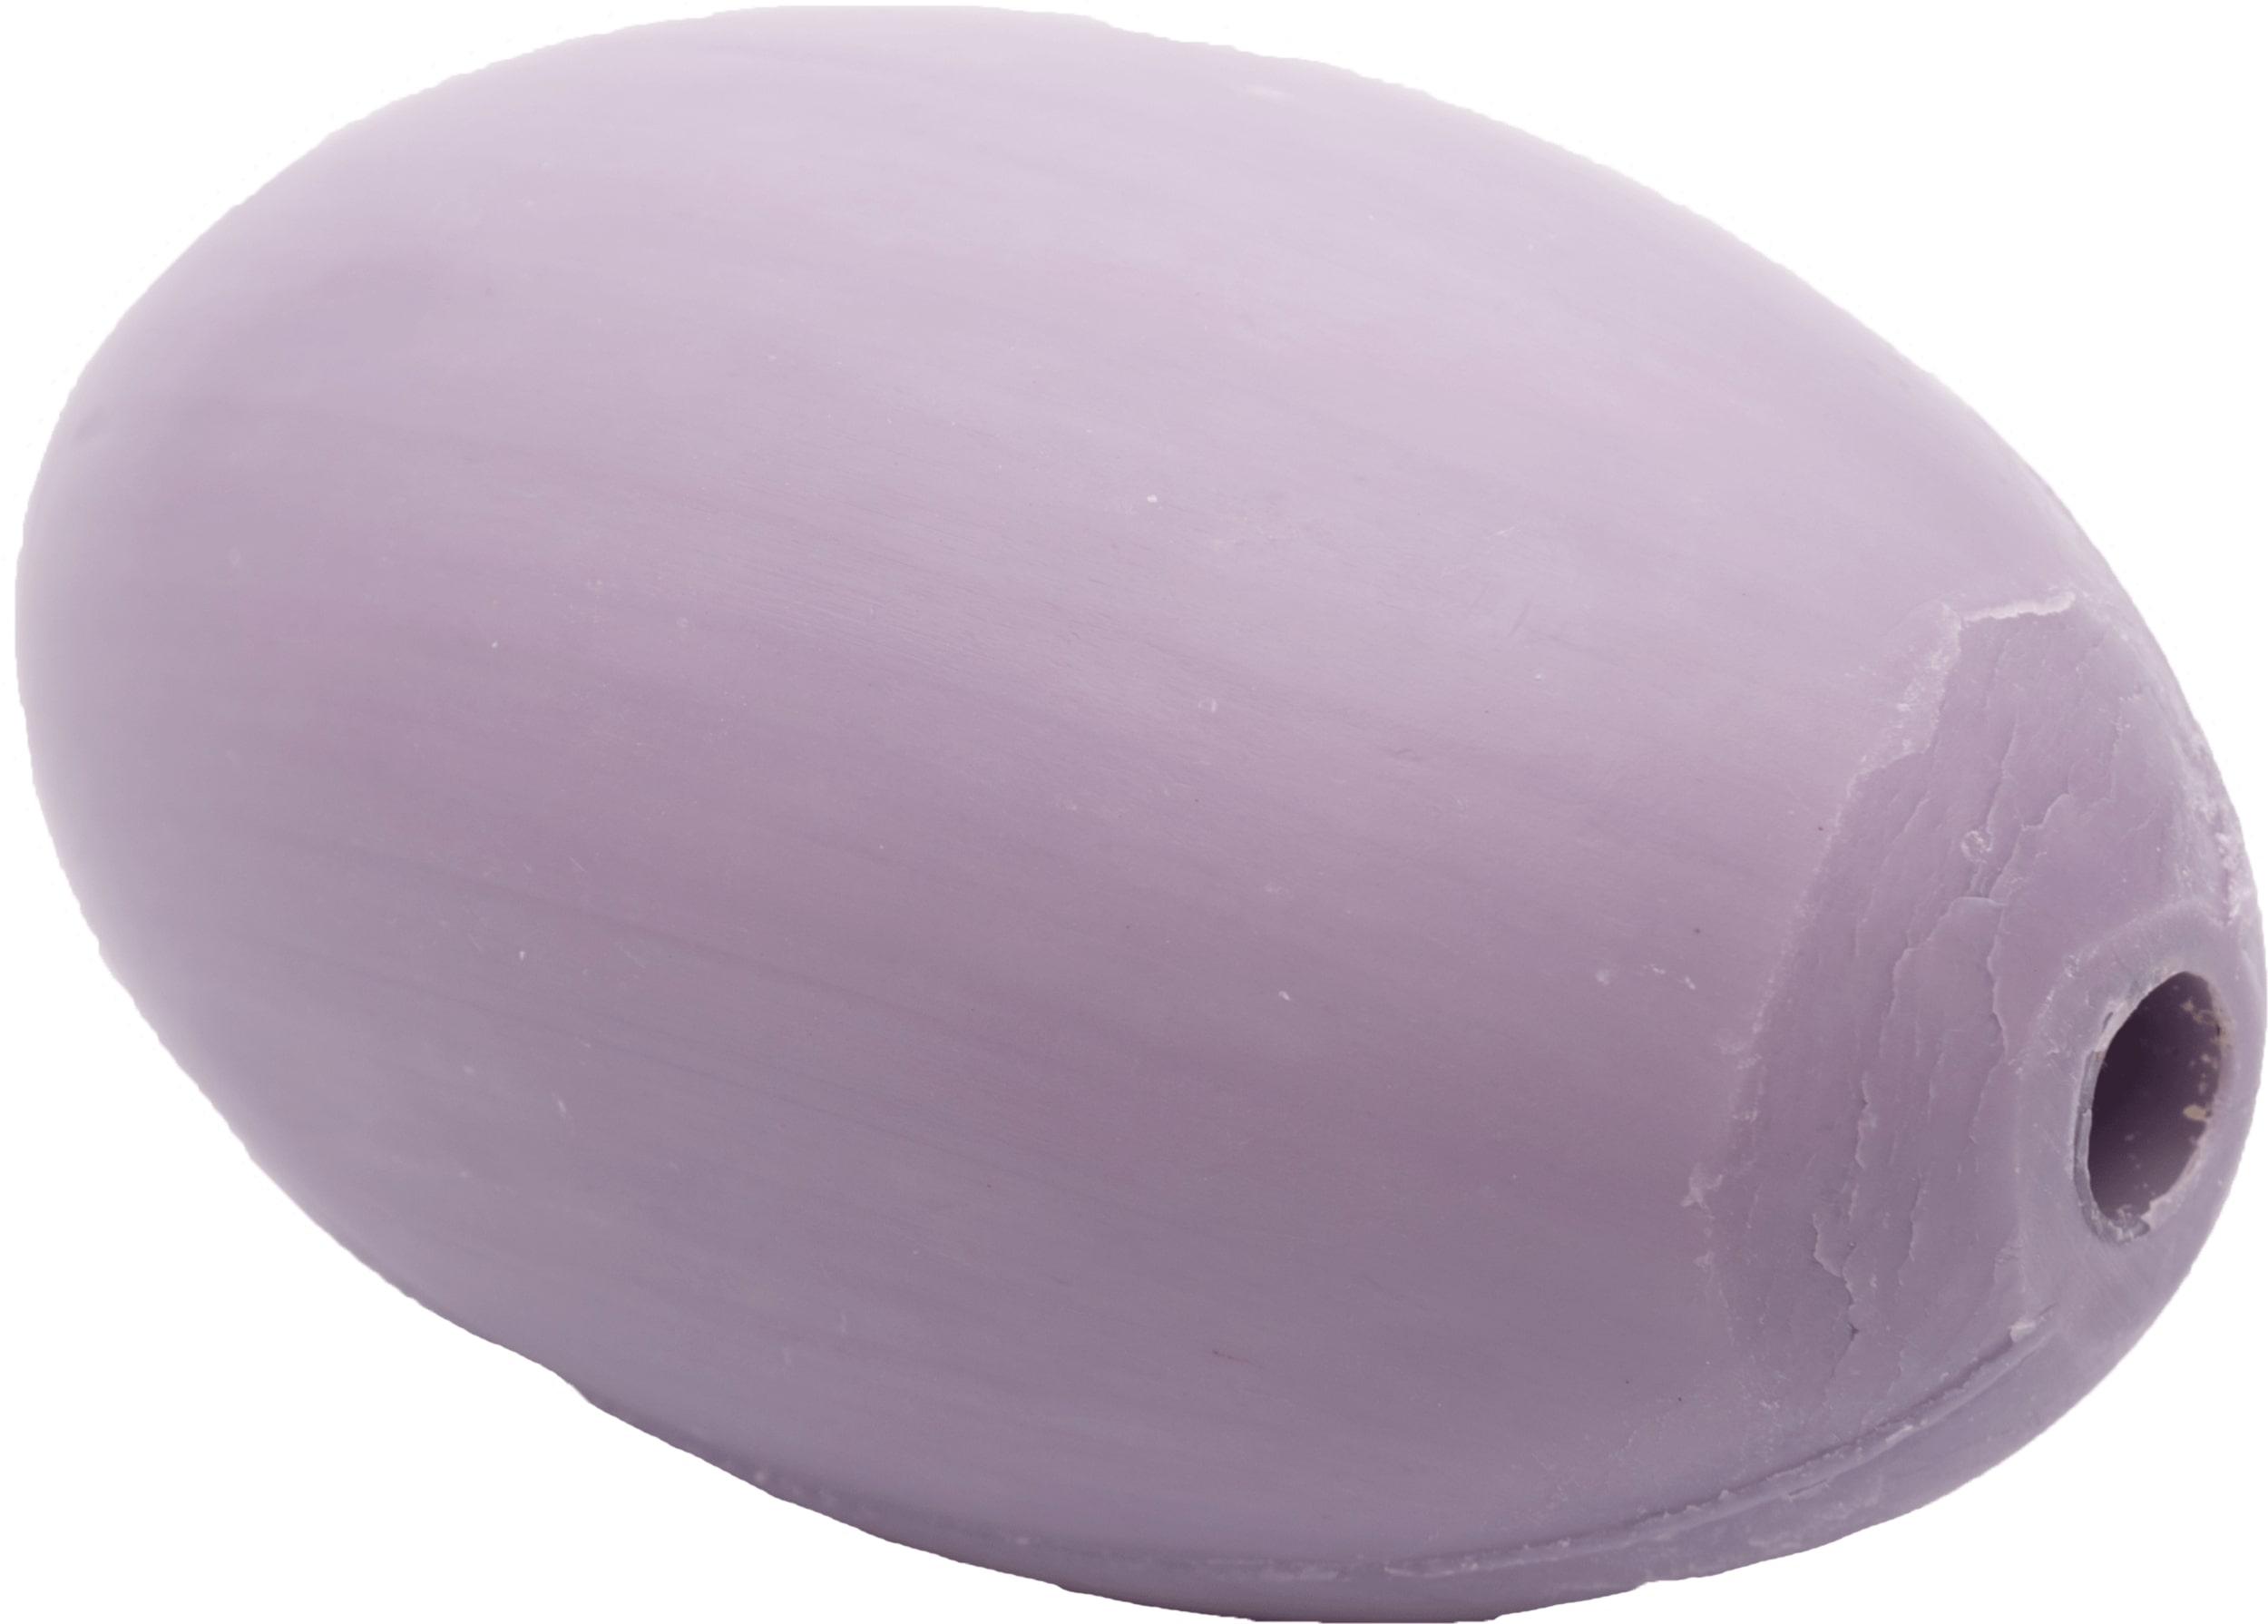 Rotationsseife Nachfüllung 260g - Lavendel